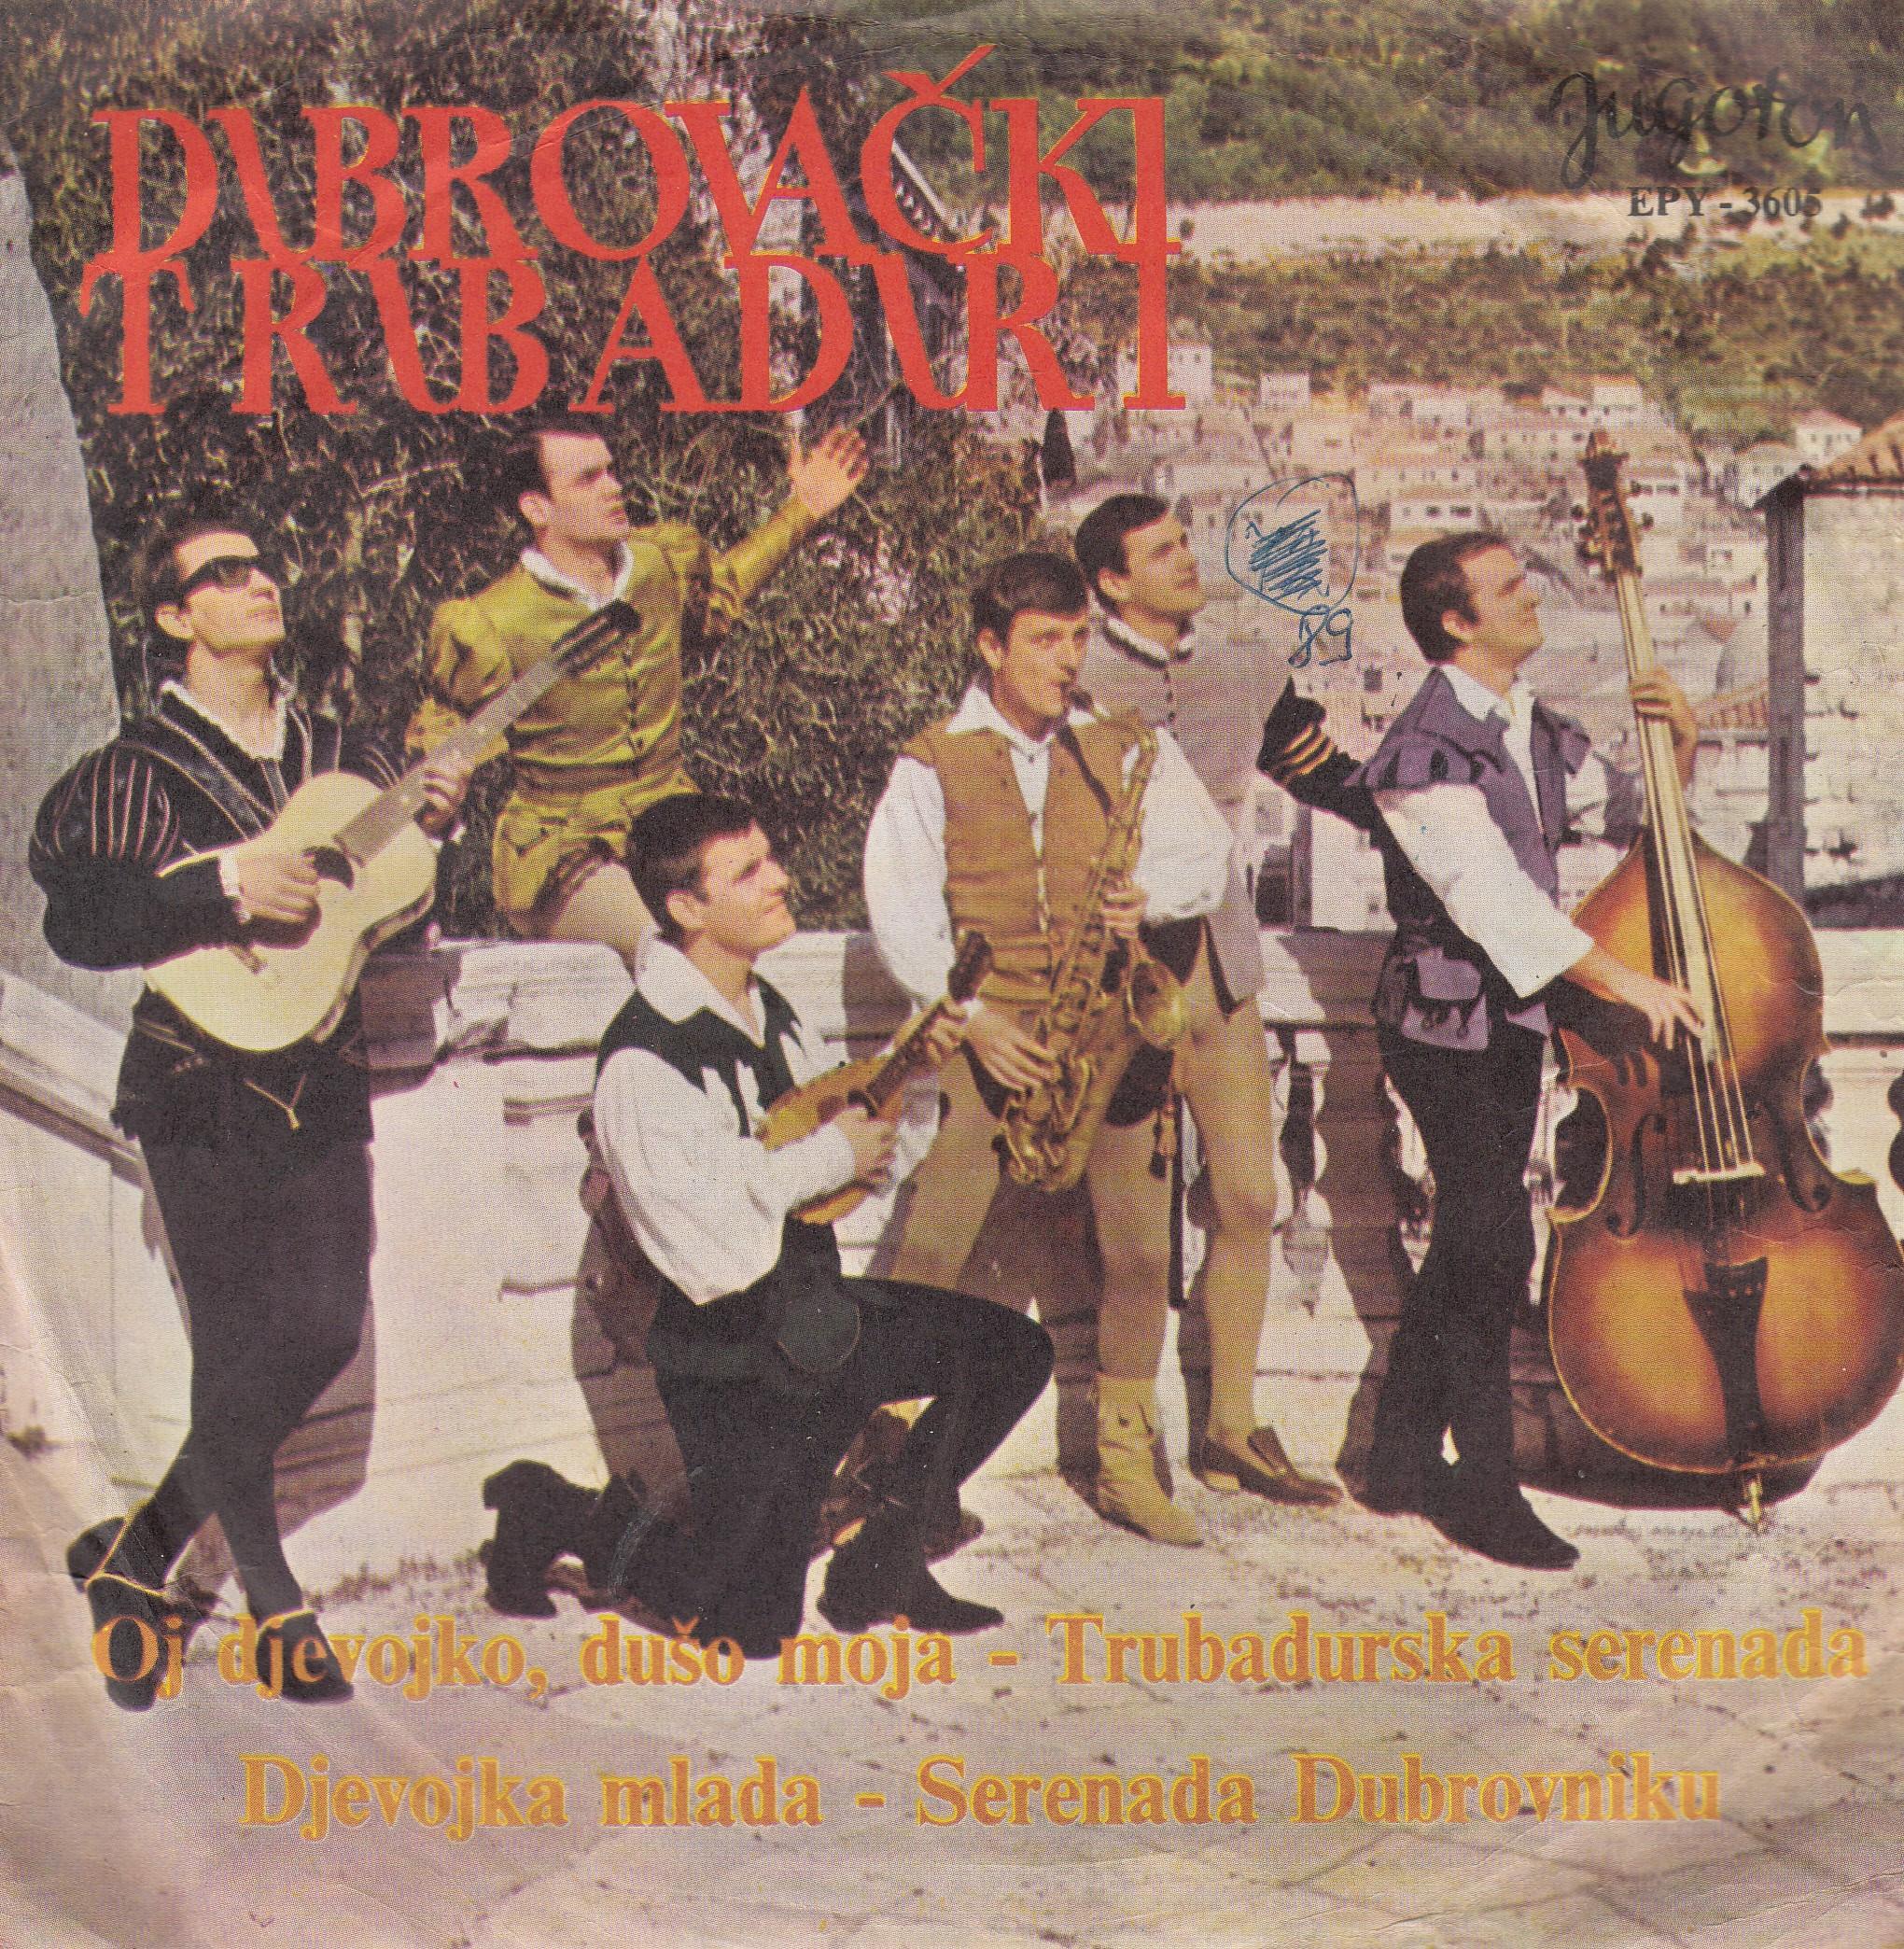 Dubrovacki Trubaduri - Oj Djevojko Duso Moja/trubadurska Serenada/djevojko Mlada/serenada Dubrovniku